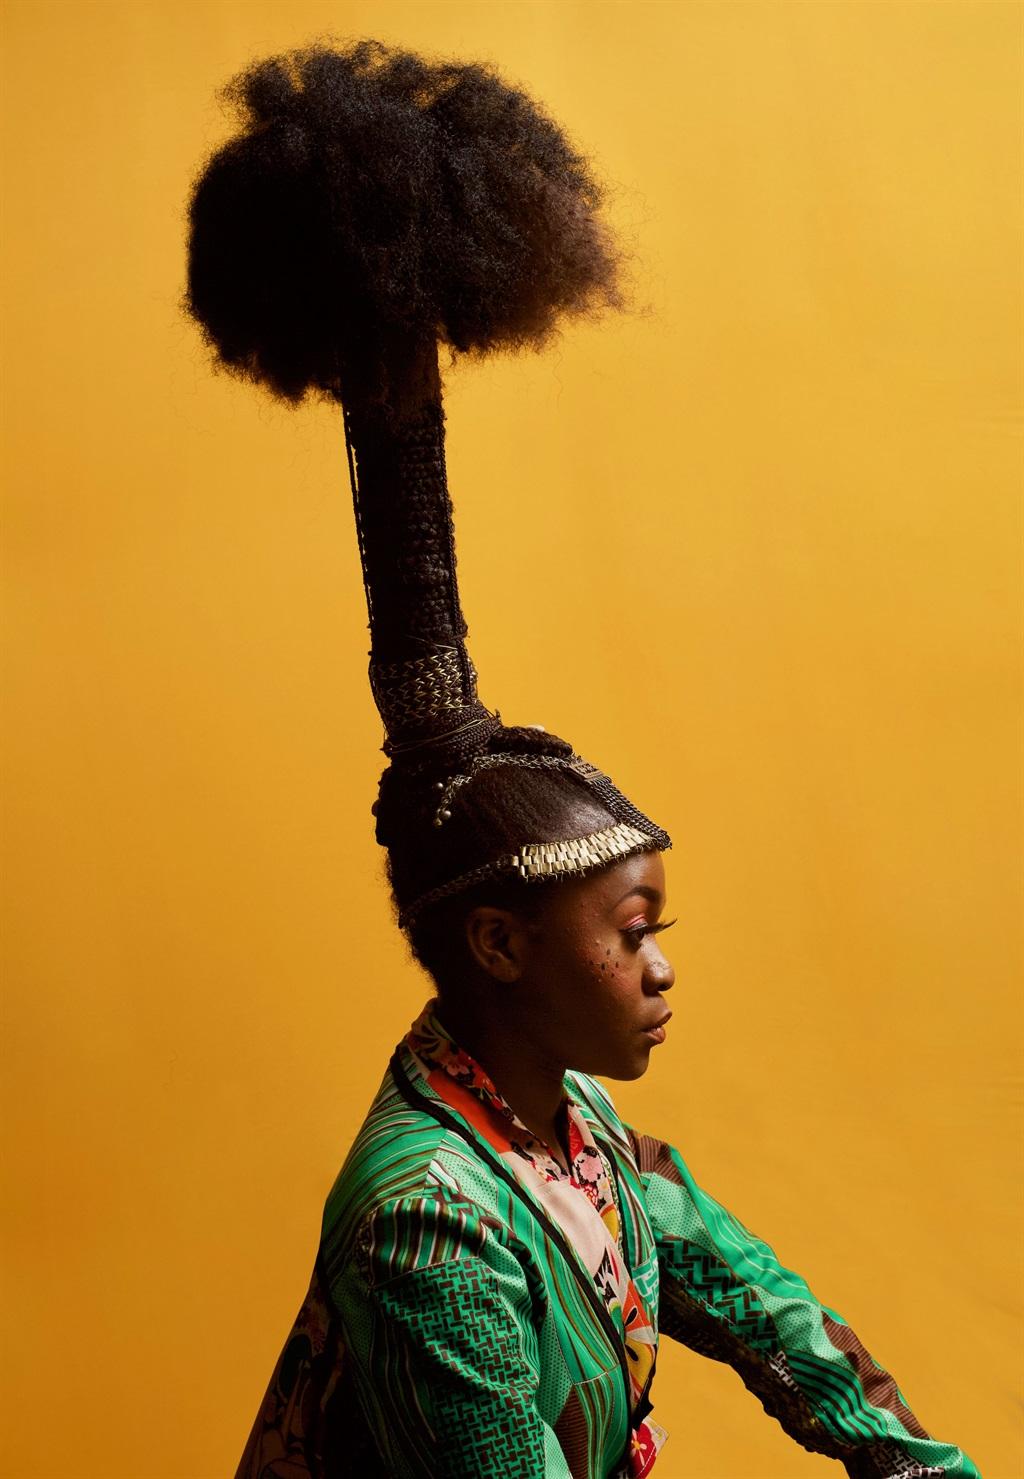 Zambia-born, Botswana-raised hip hop artist Sampa